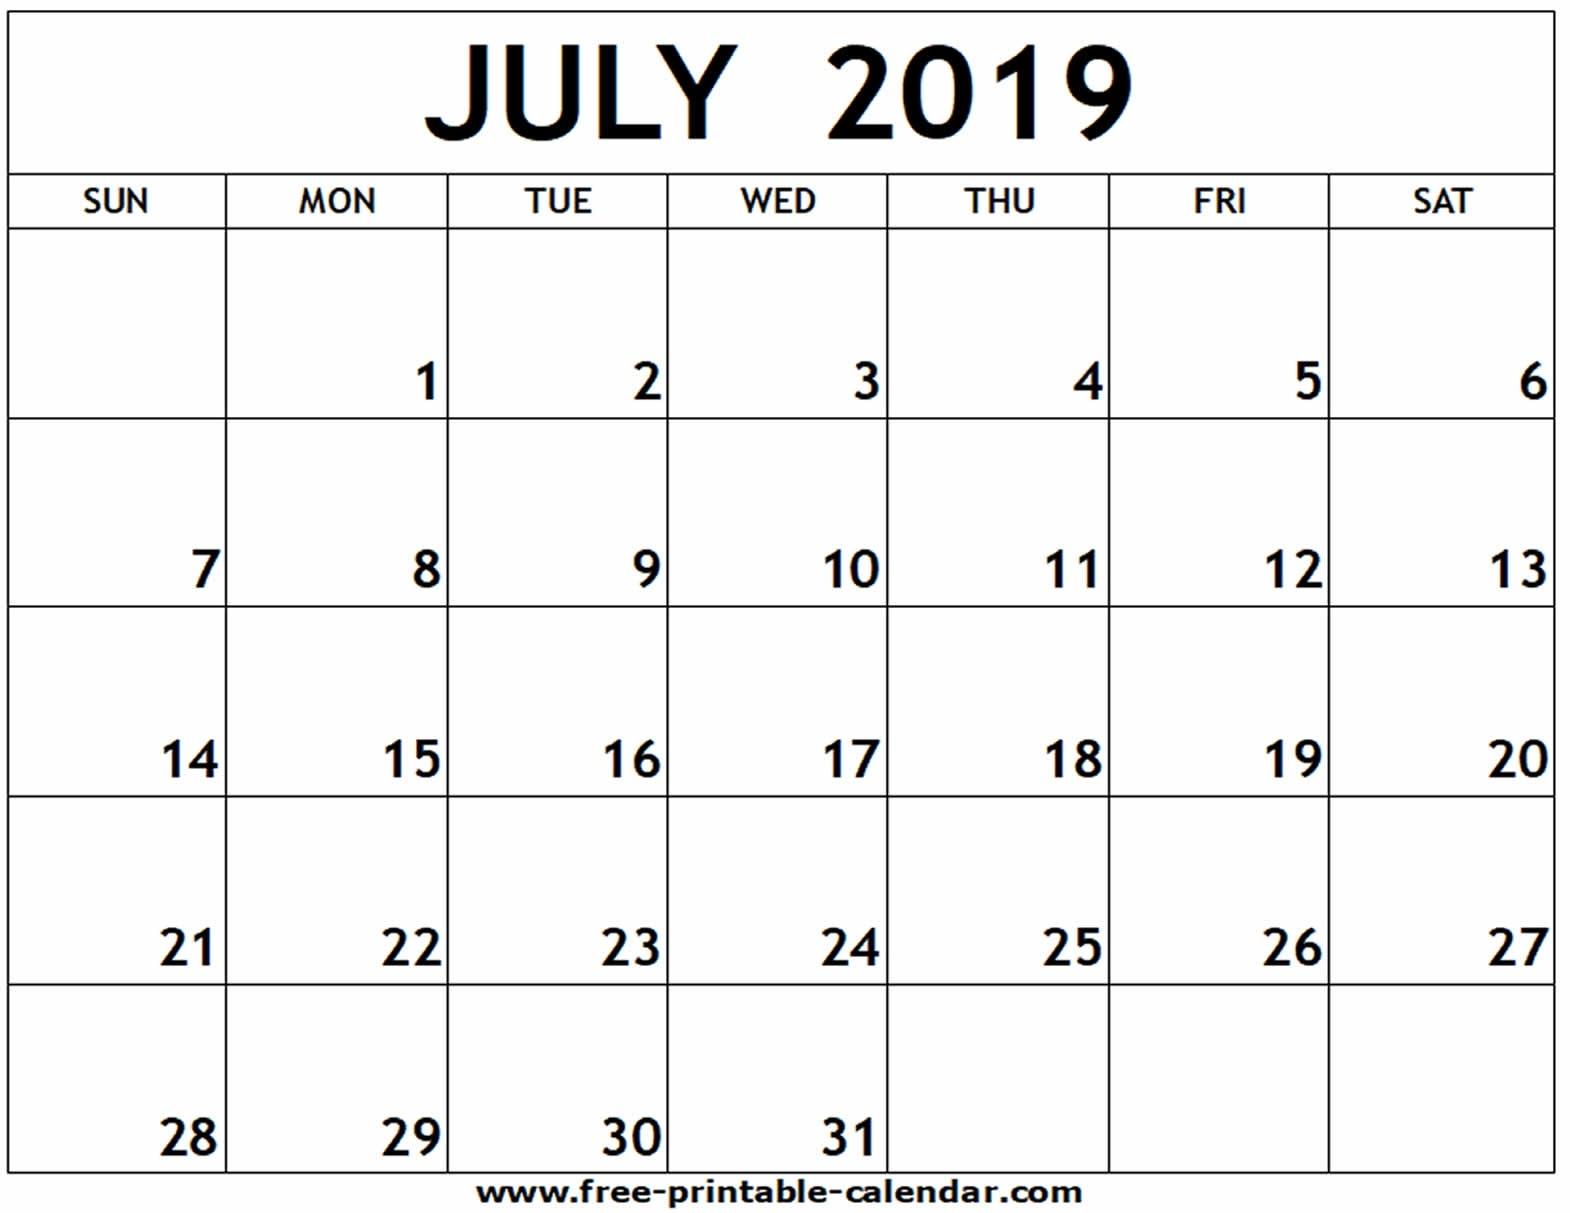 July 2019 Printable Calendar - Free-Printable-Calendar_Blank Calendar July 17